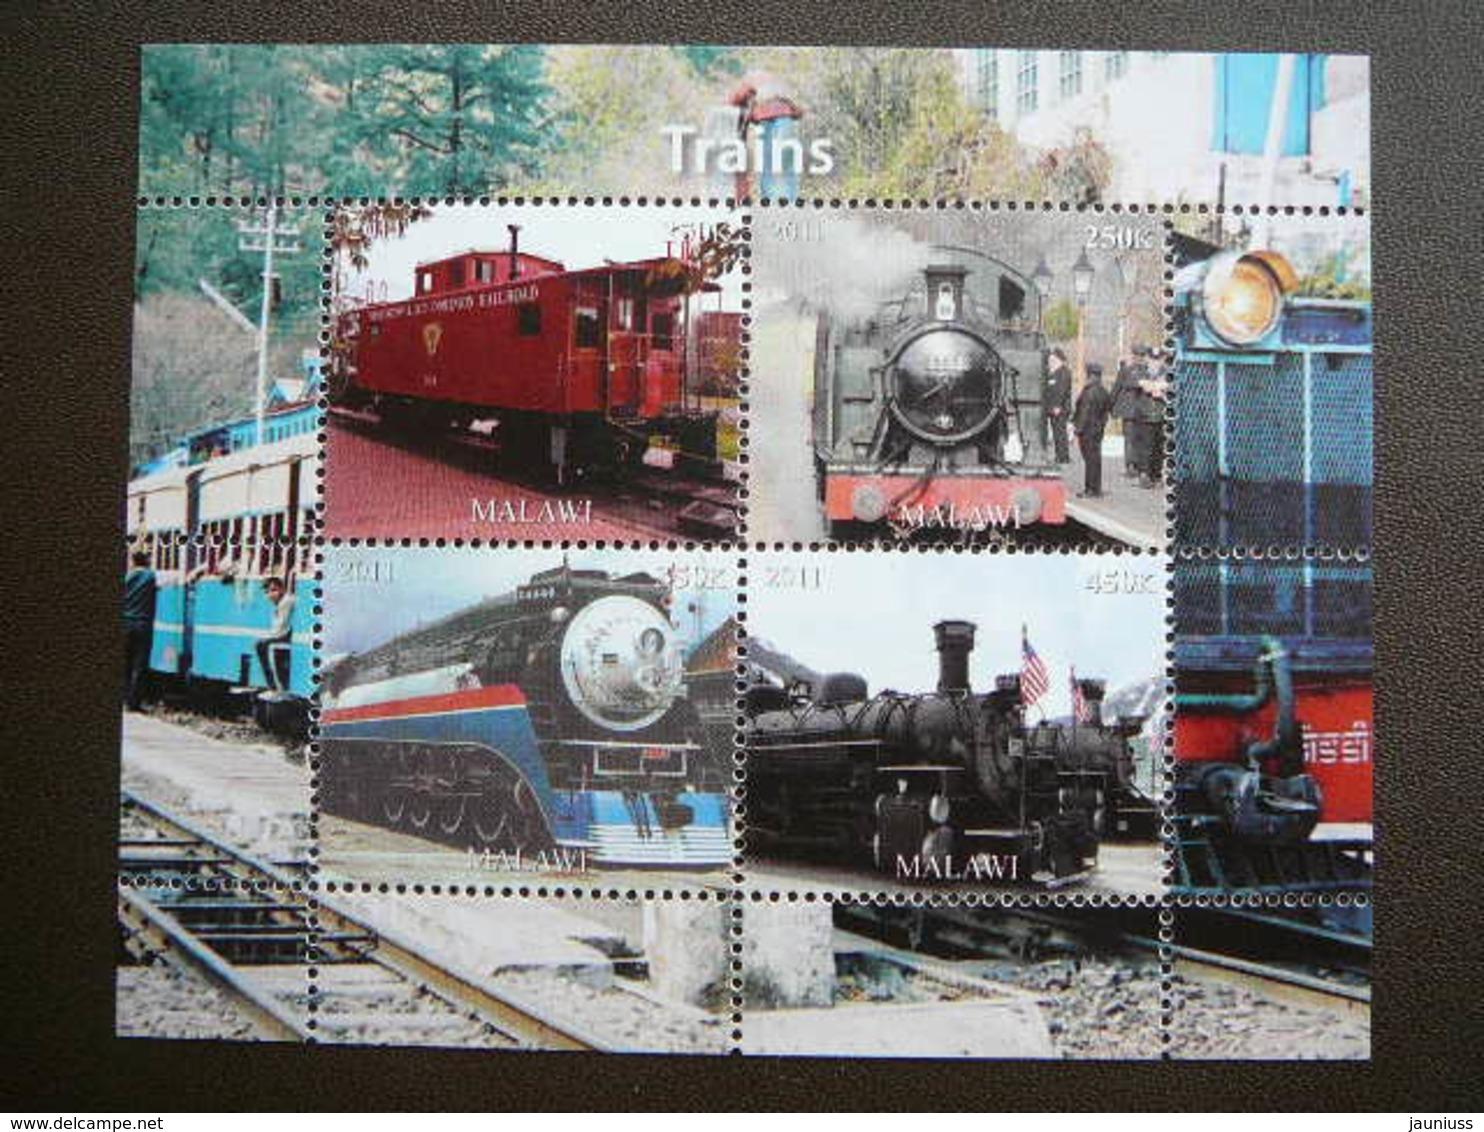 Trains. Züge. Vapeurs # 2011 MNH S/s # (1861) # Locomotives Transport - Trains